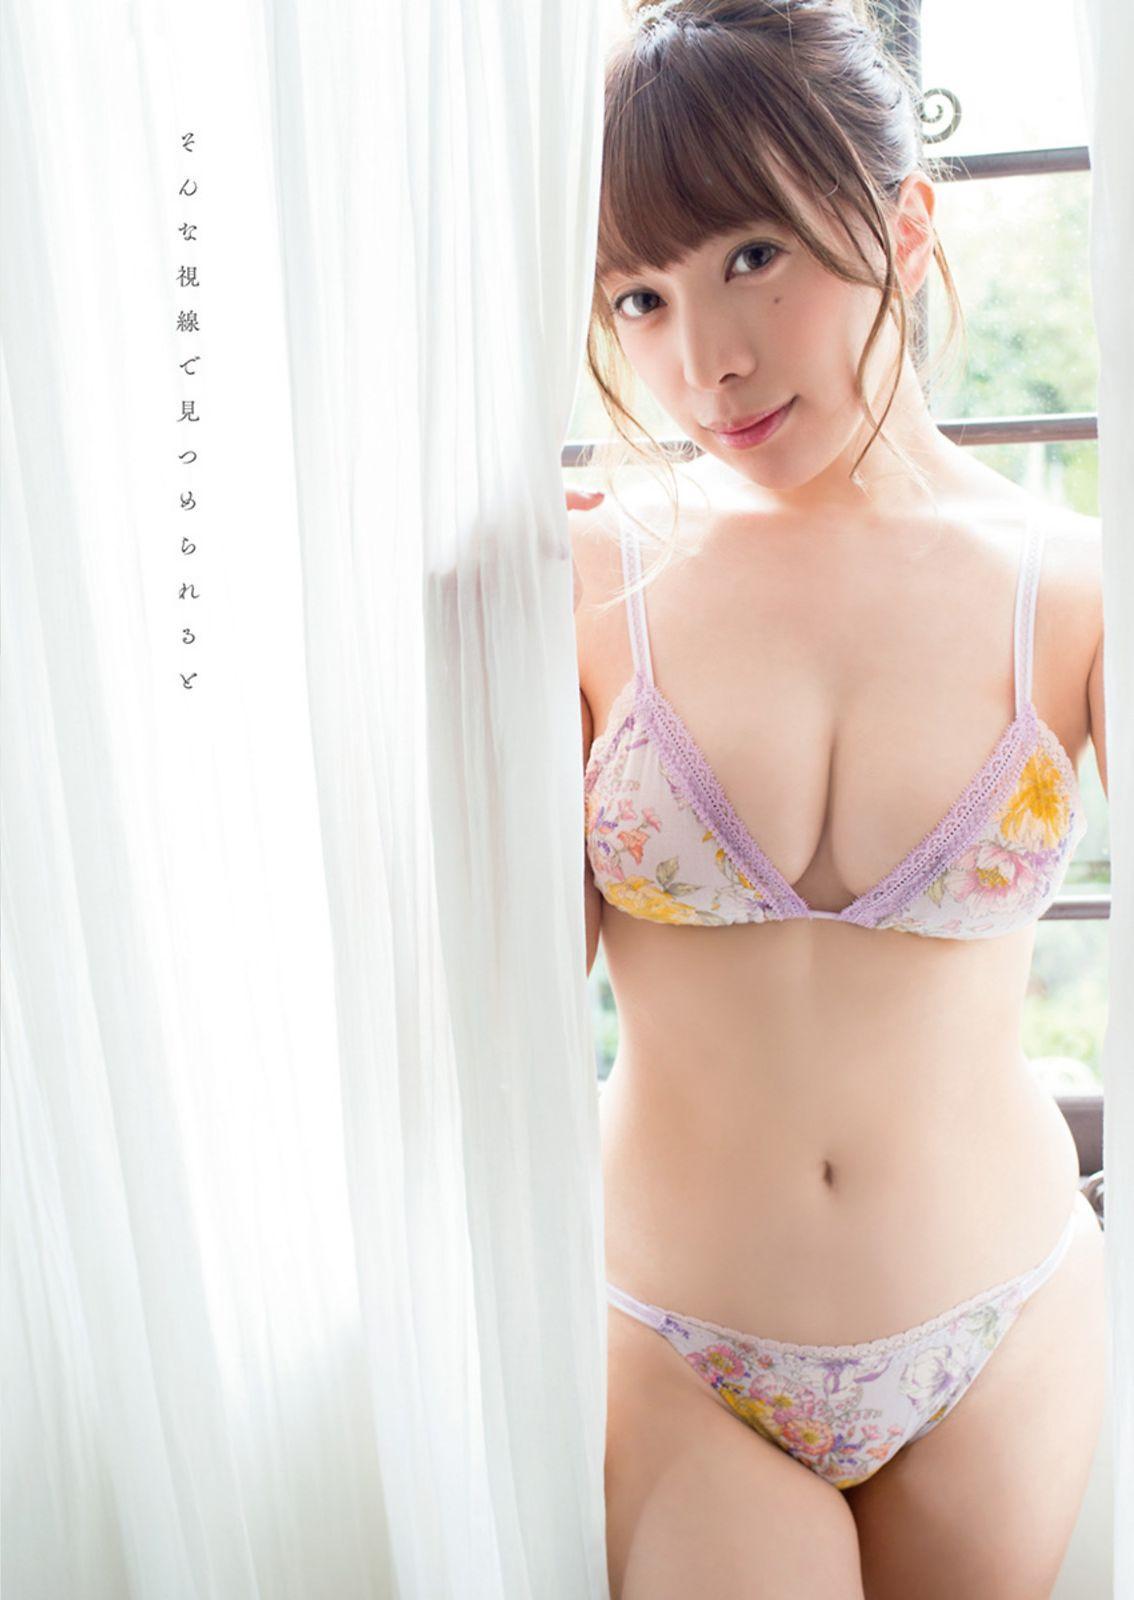 enako 宫本彩希 Young Animal